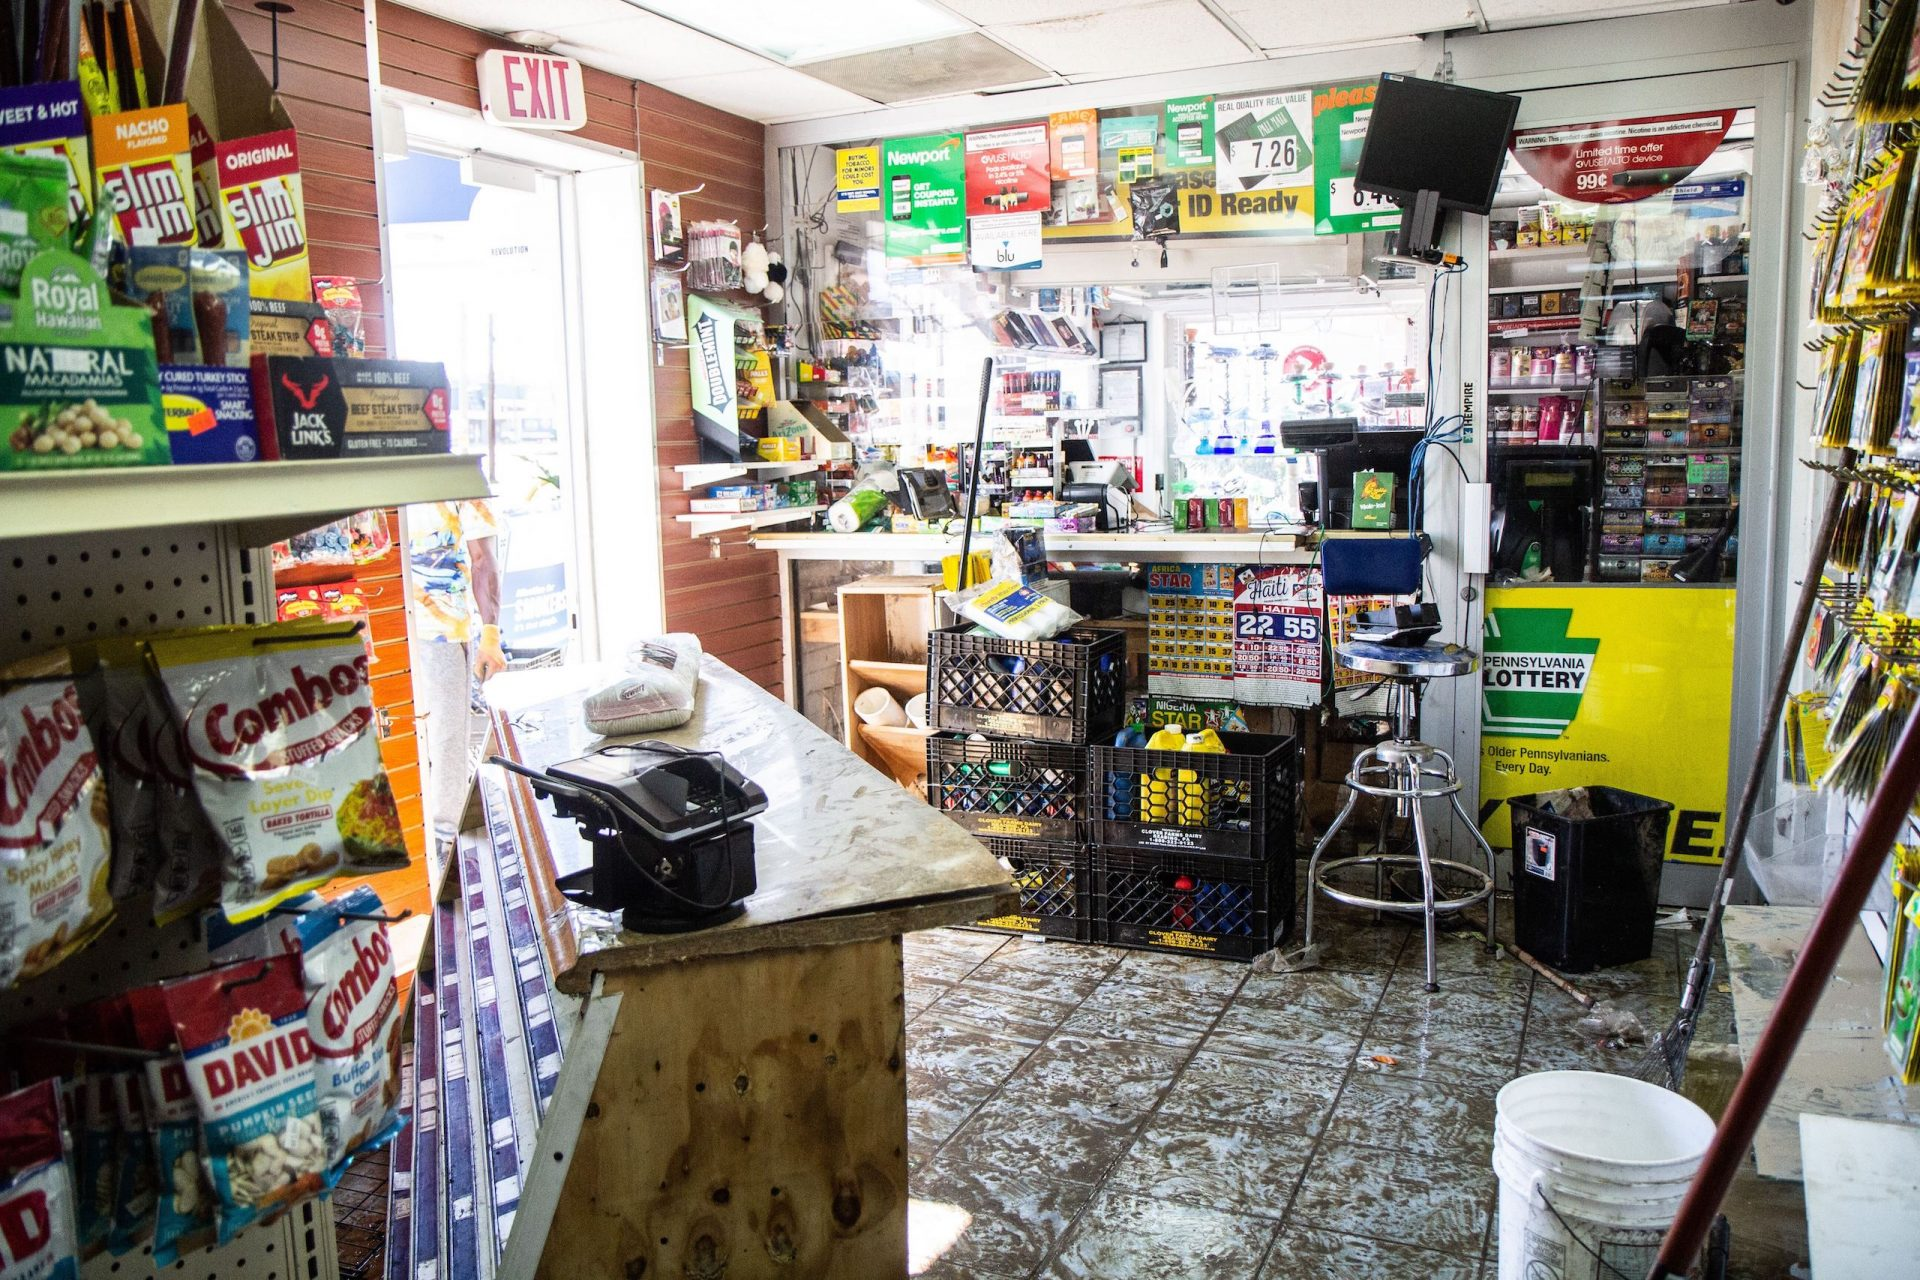 The aftermath at 69th Street Car Wash and Smoke Shop.